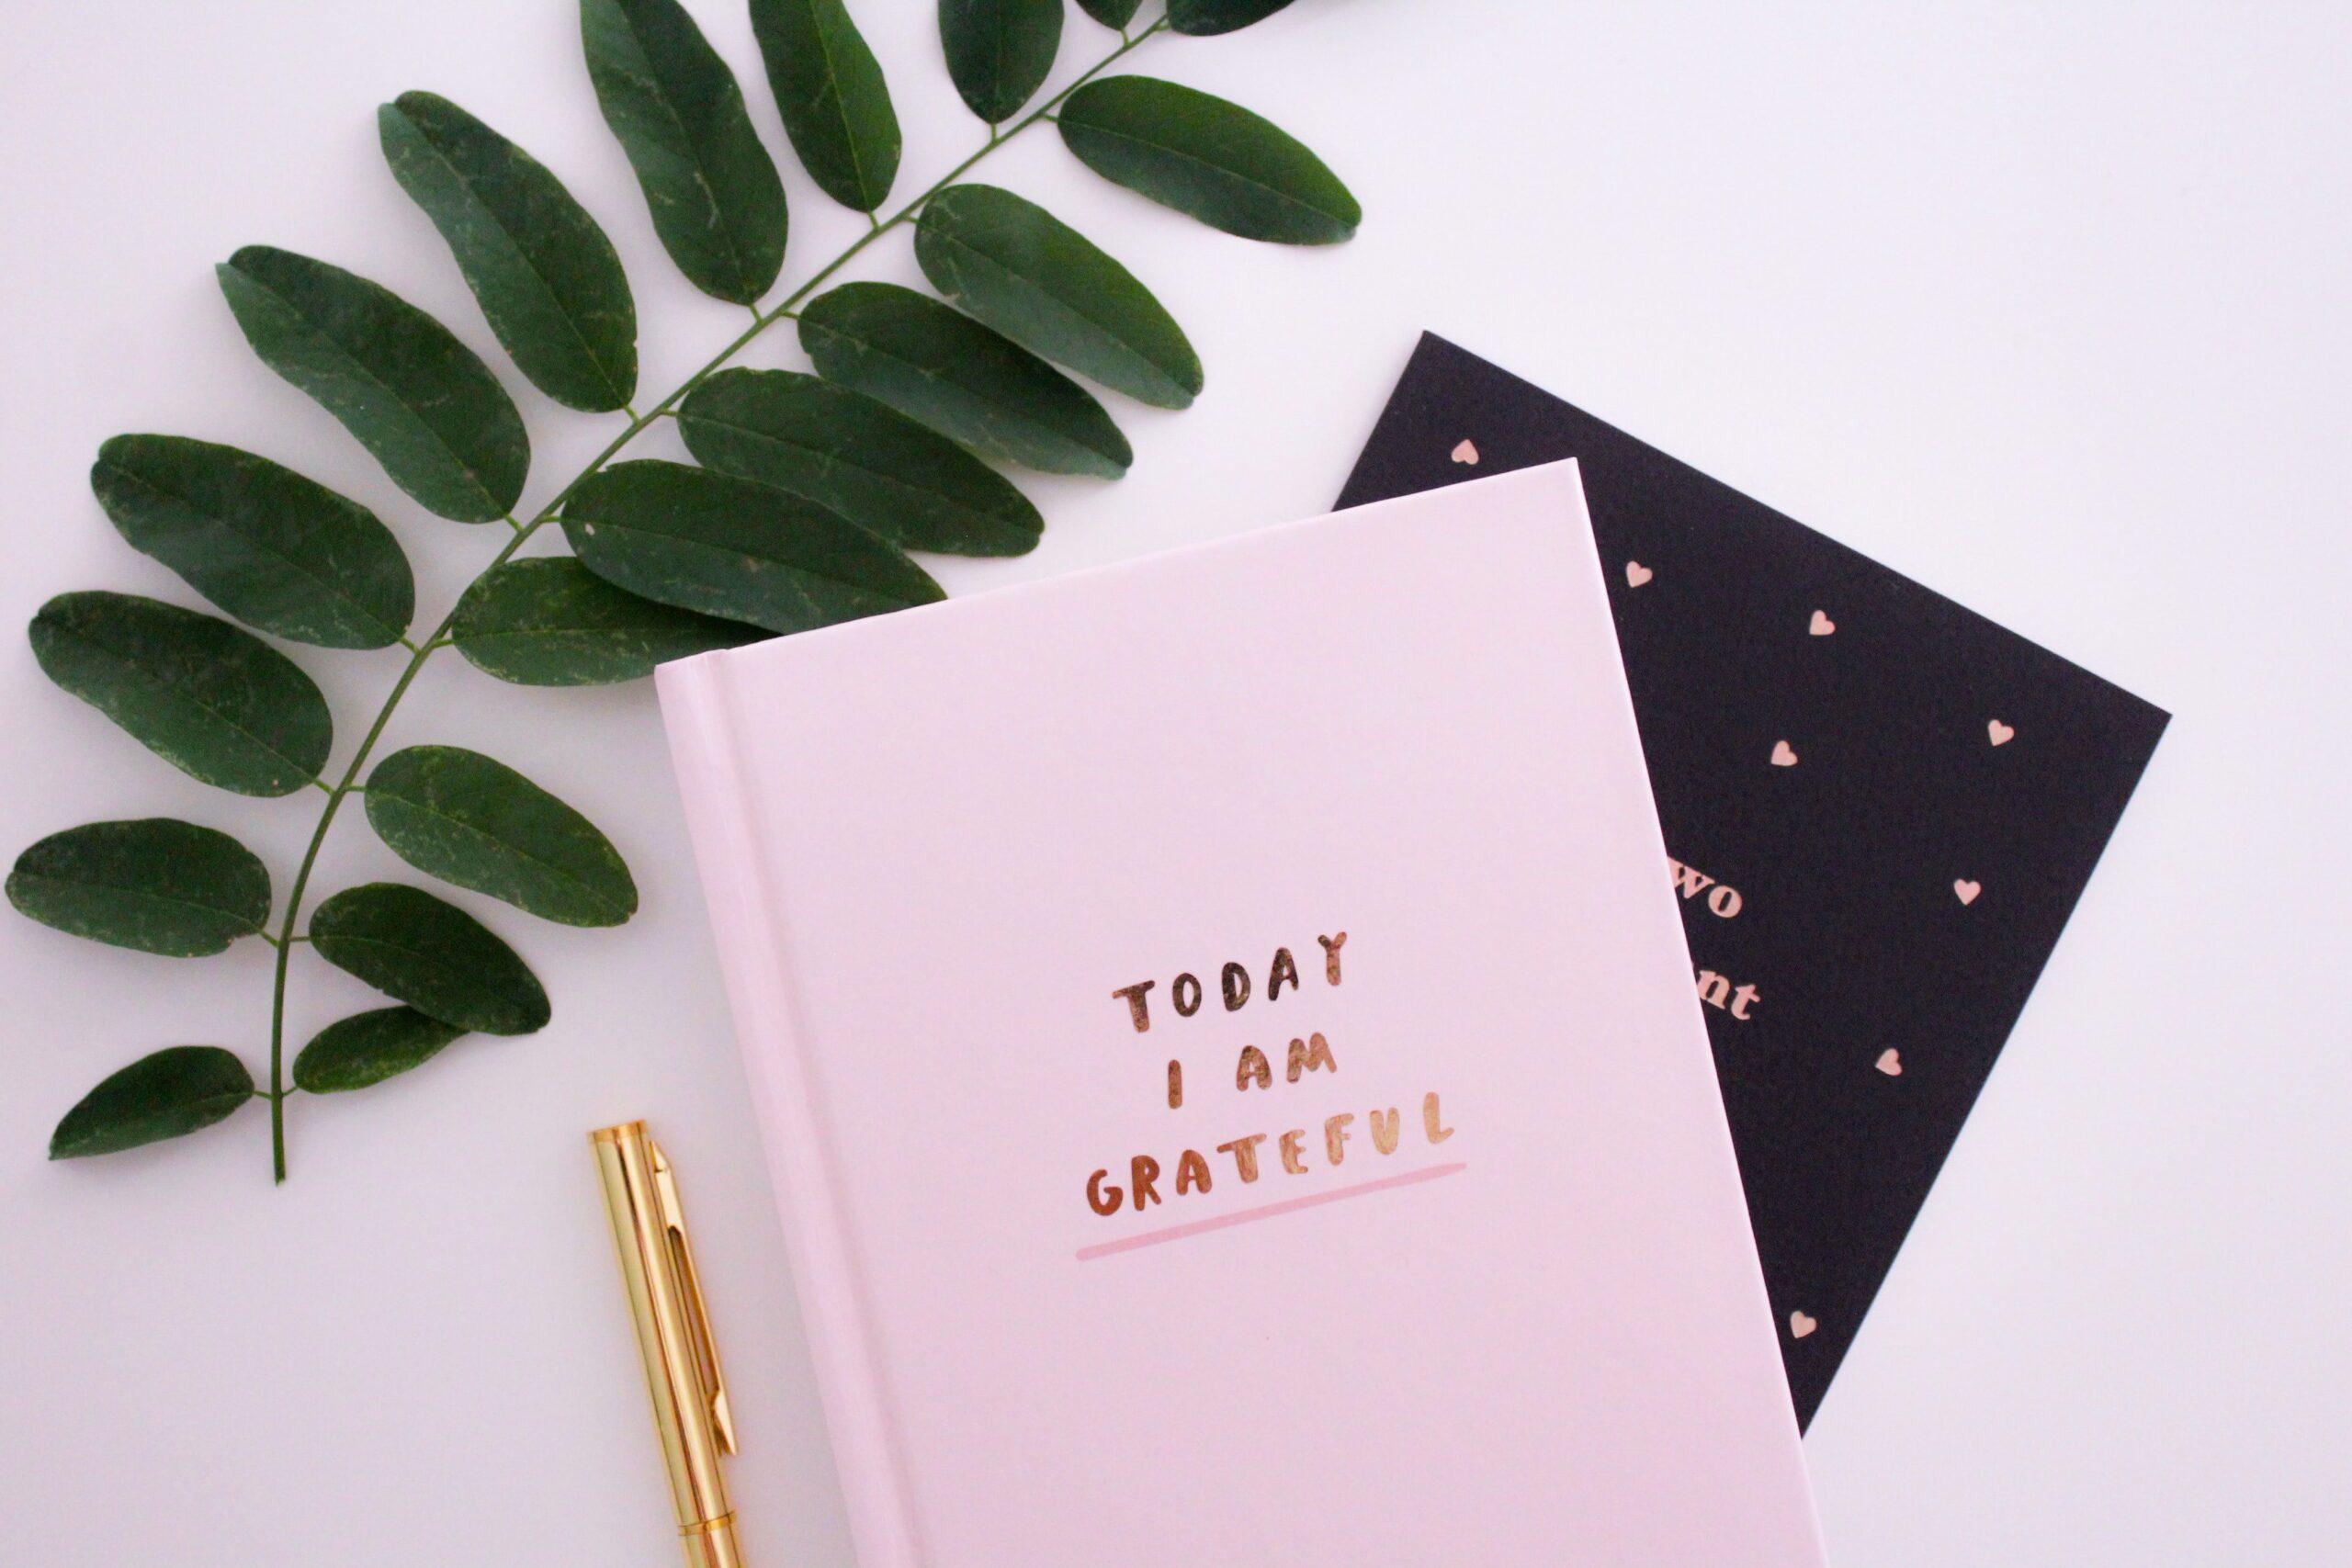 grateful, journaling,selfishness,envy,comparison